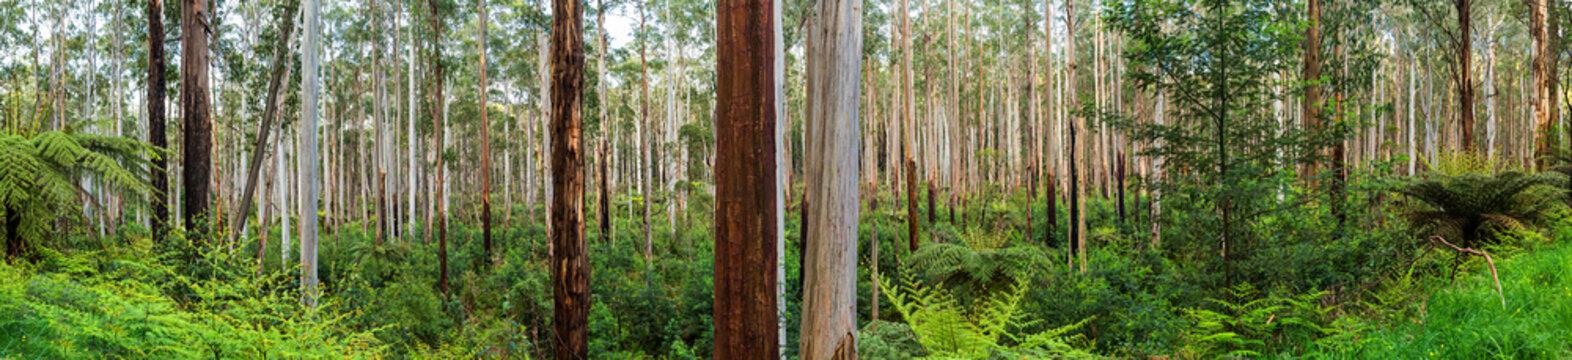 View of a beautiful temperate rainforest near Melbourne in Victoria, Australia